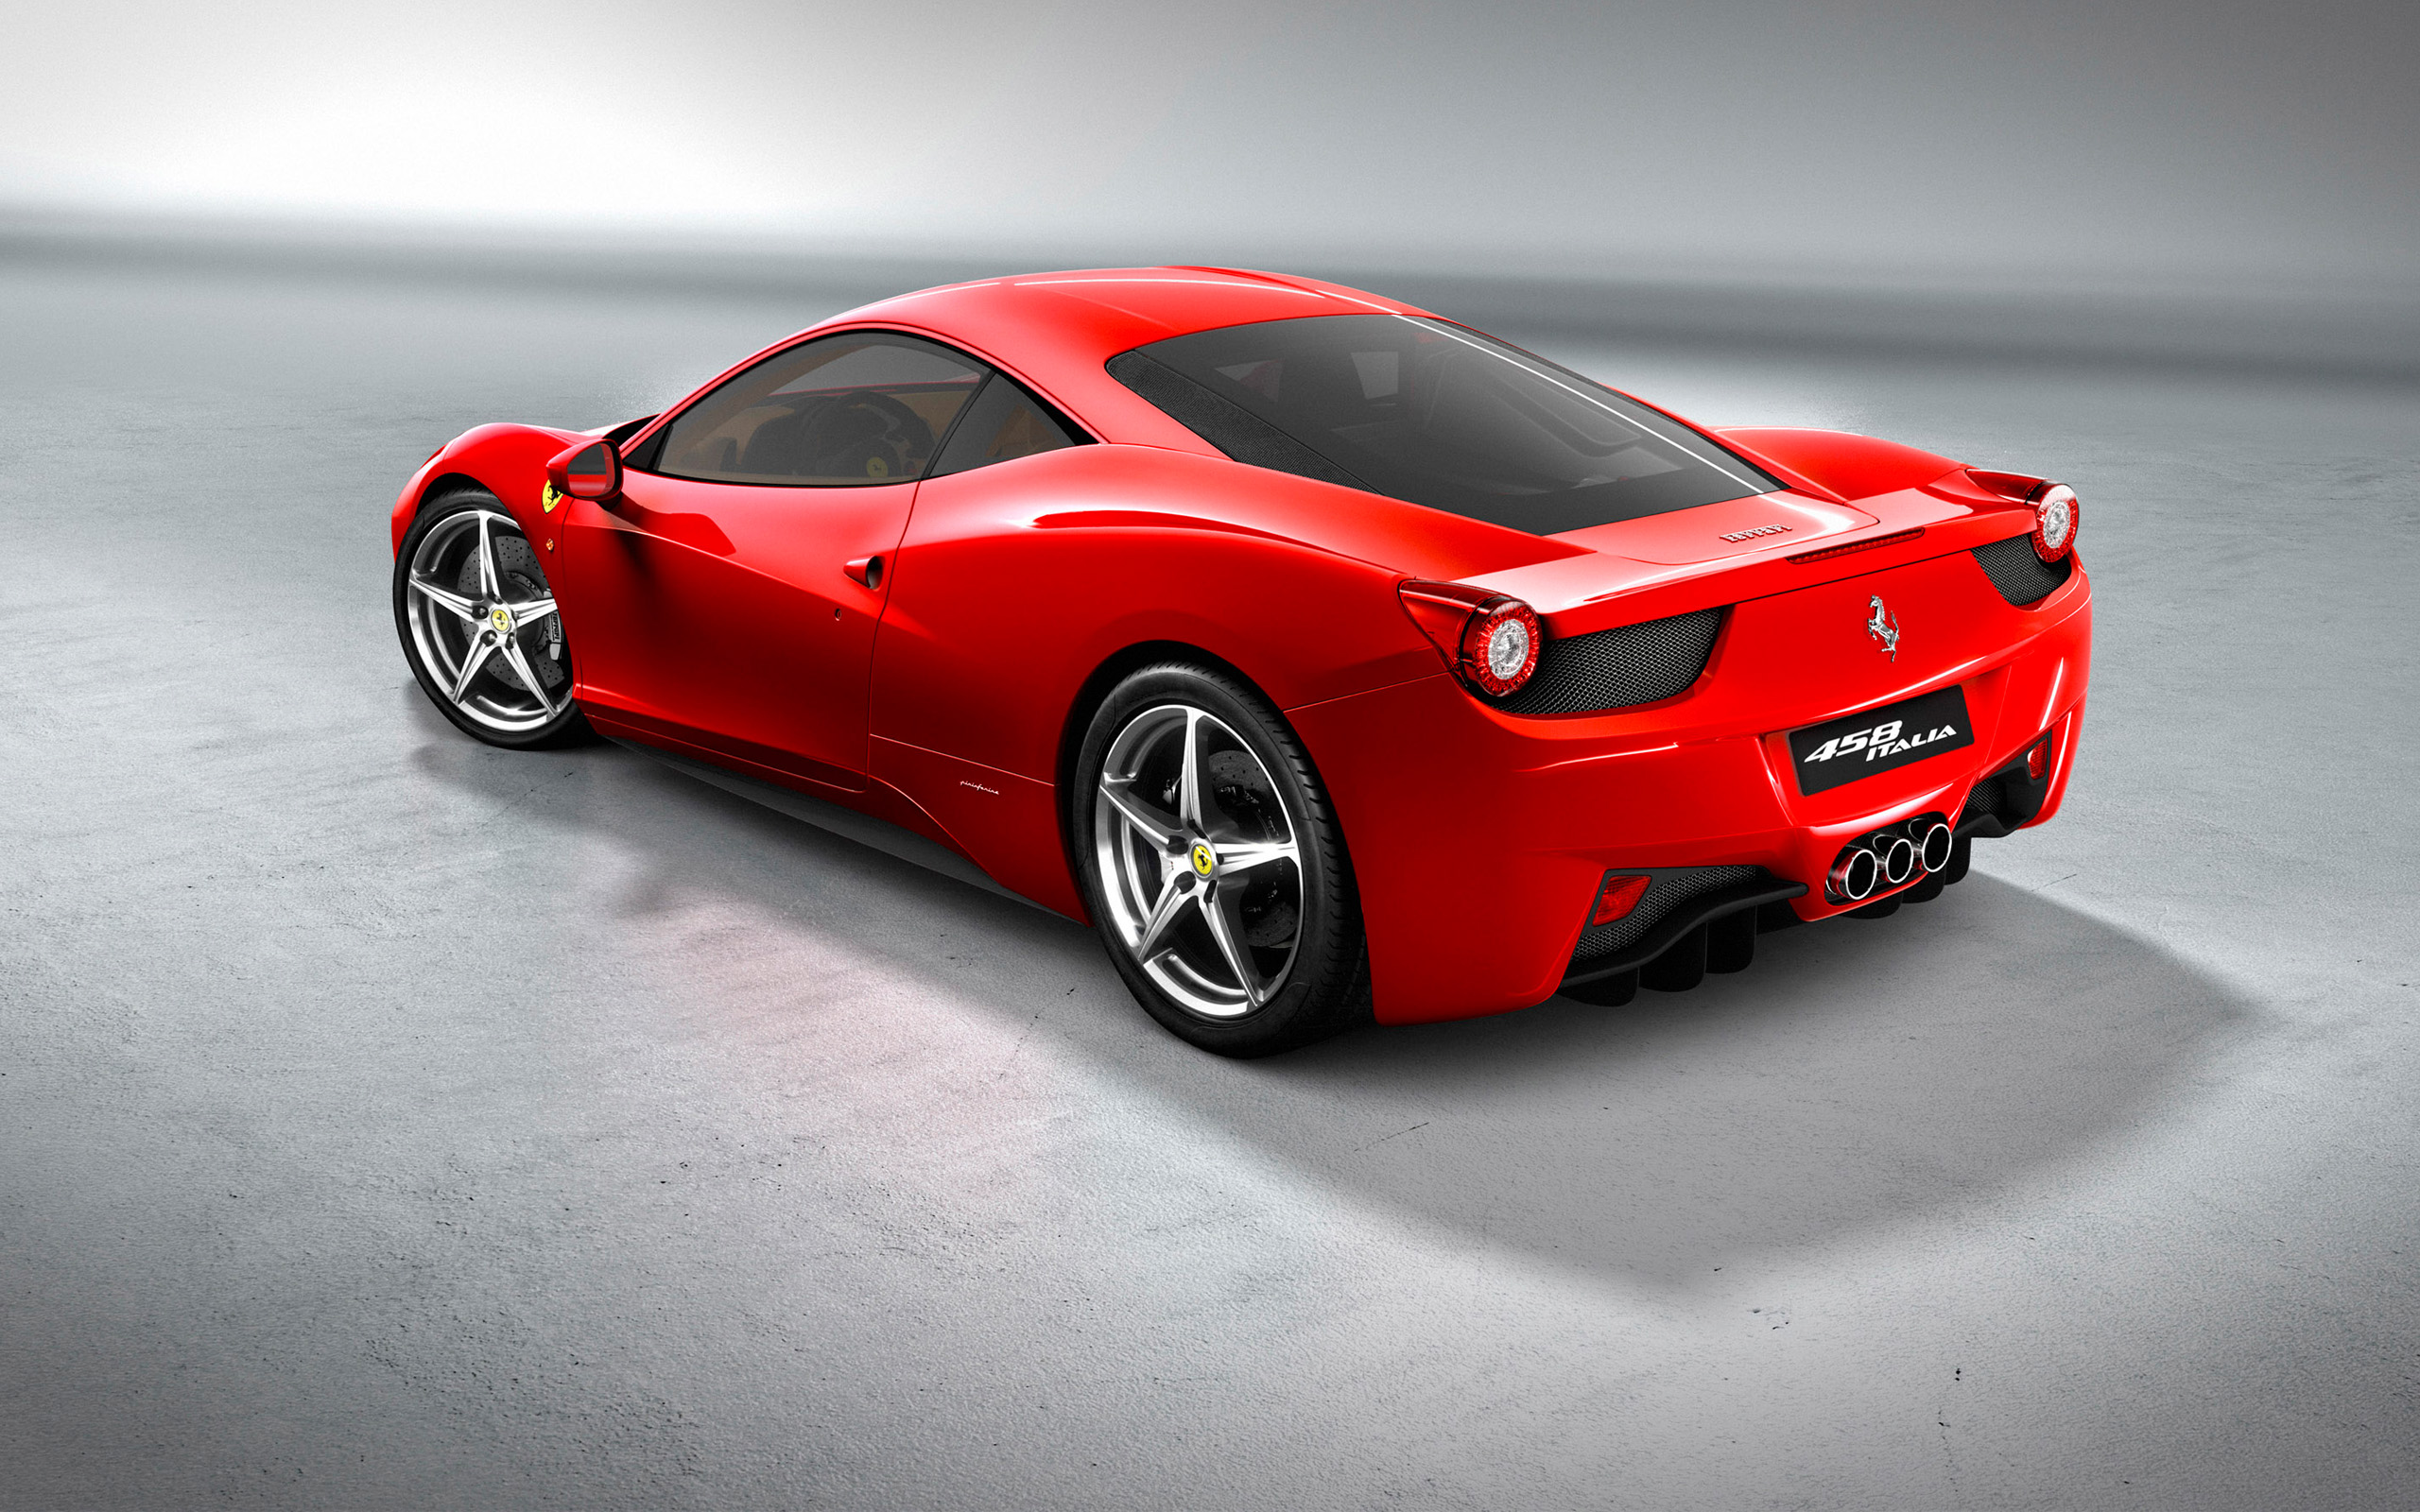 HD Wallpapers Sexy Ferrari italia Car